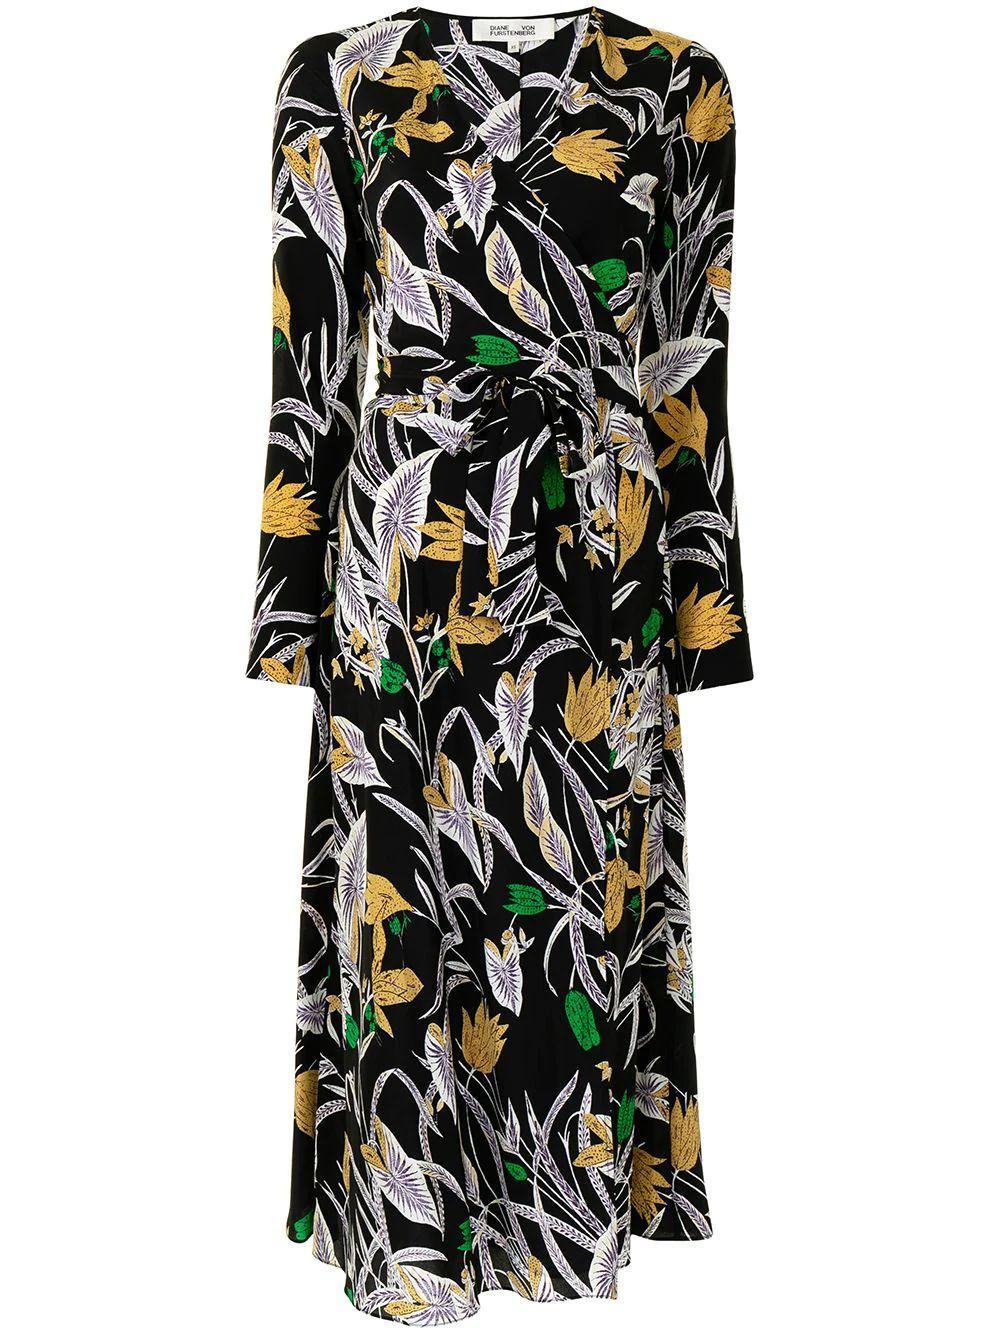 Tilly Botanical Wrap Dress